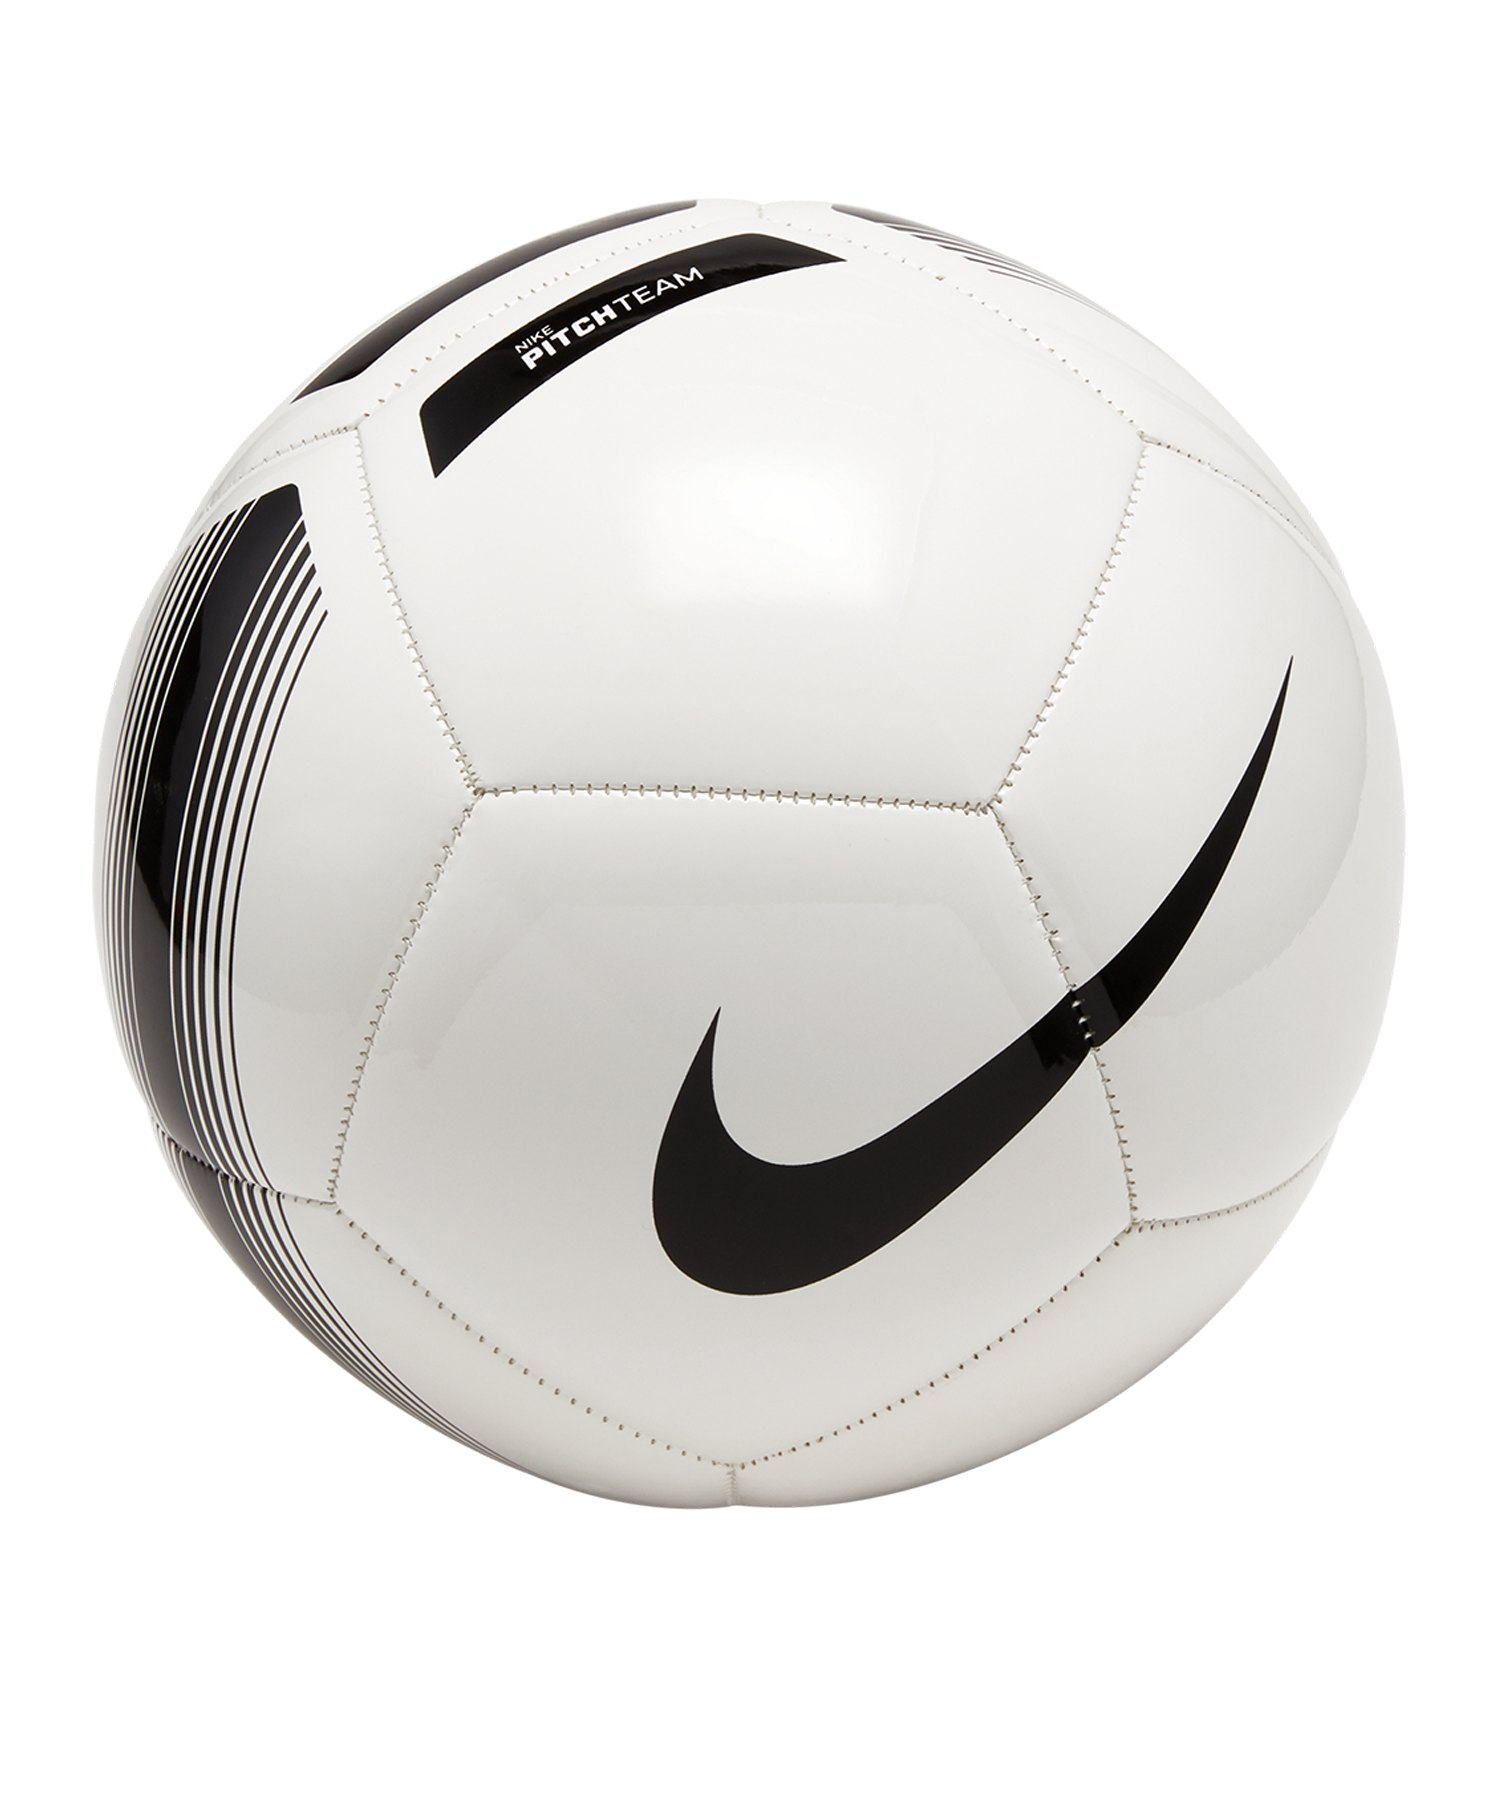 Nike Pitch Team Trainingsball Weiss F100 - weiss